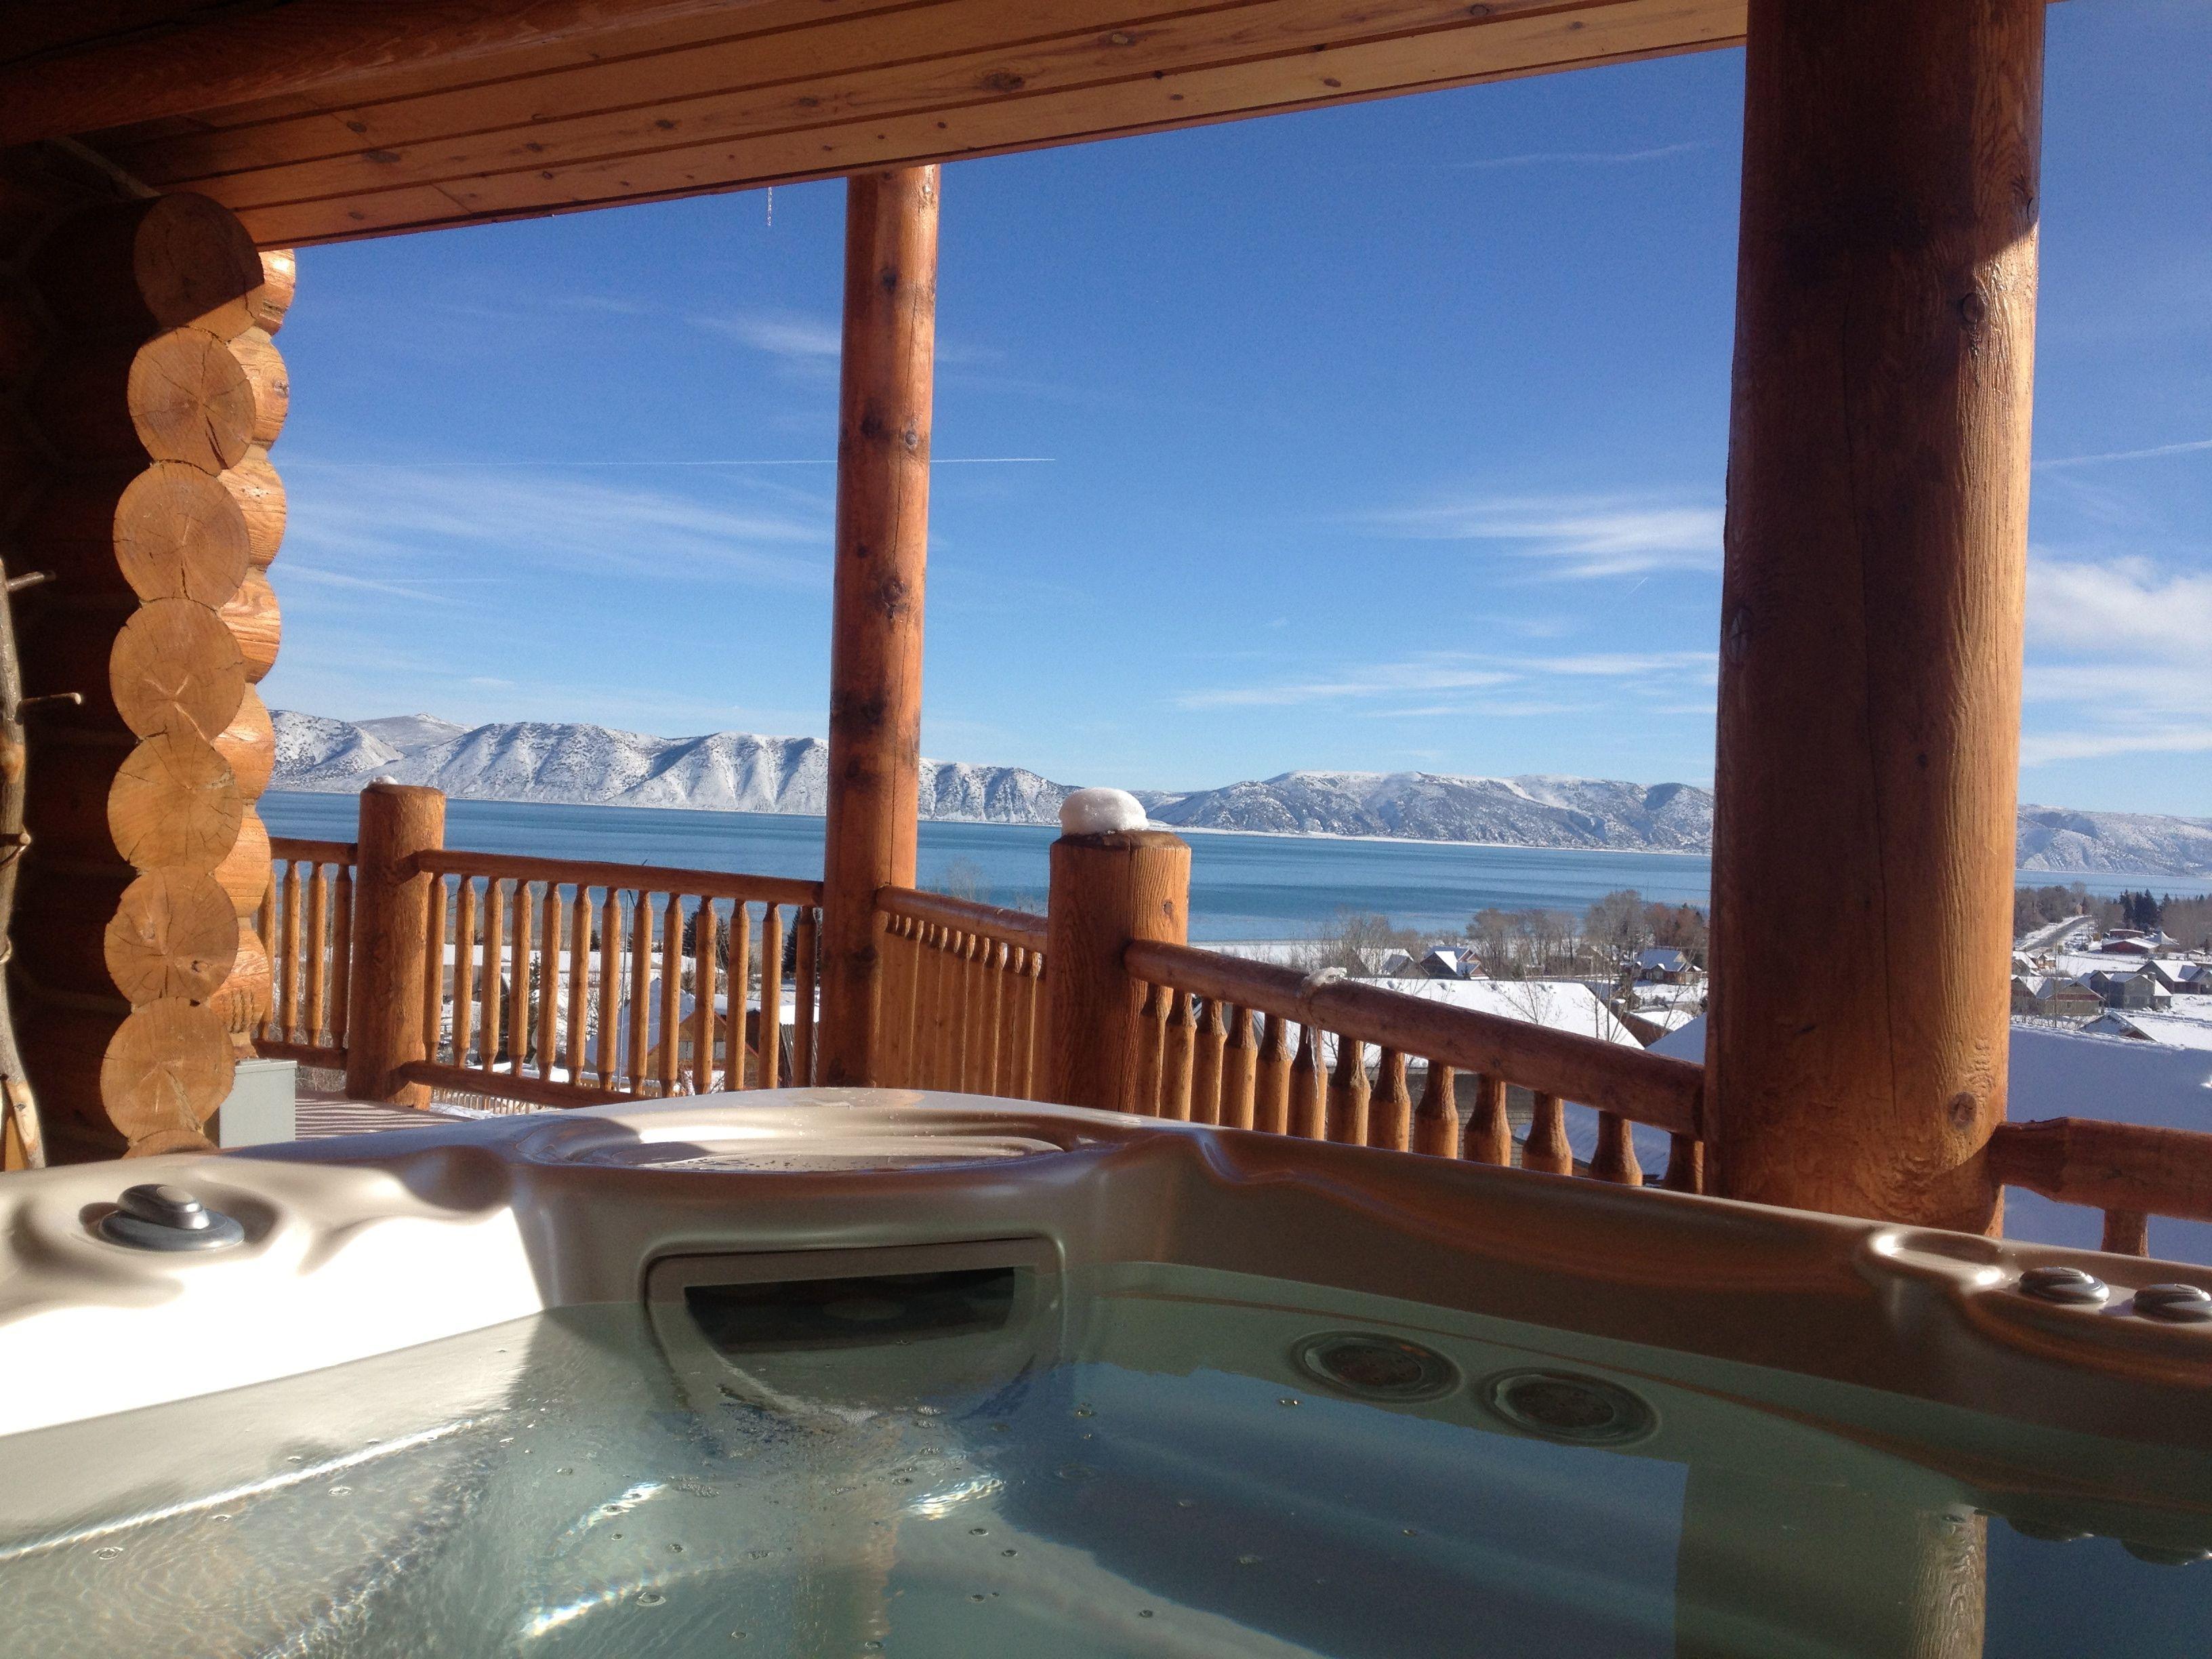 Hot tub install, Bear Lake, Utah   All Seasons Hot Tub & Spa ...